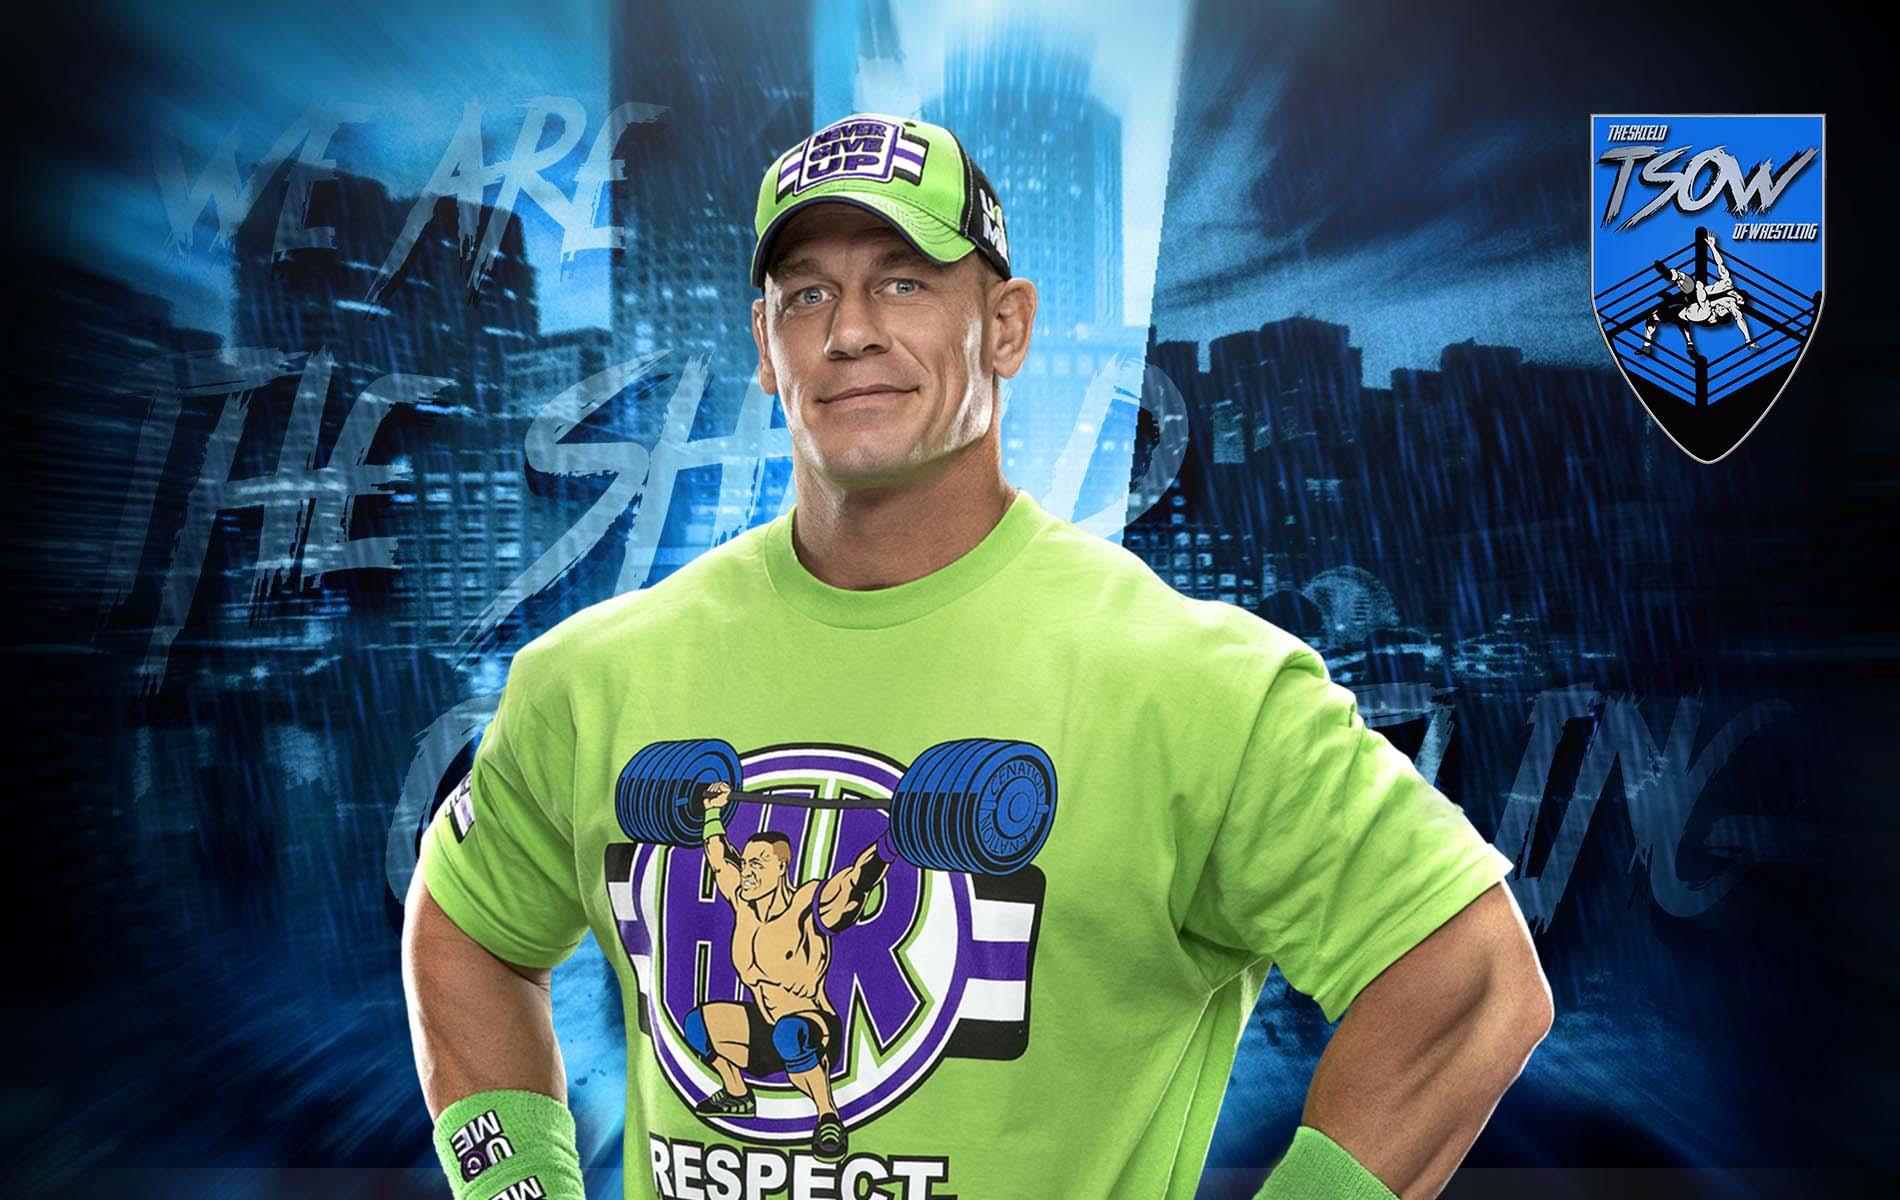 John Cena sarà nel main event di SummerSlam?